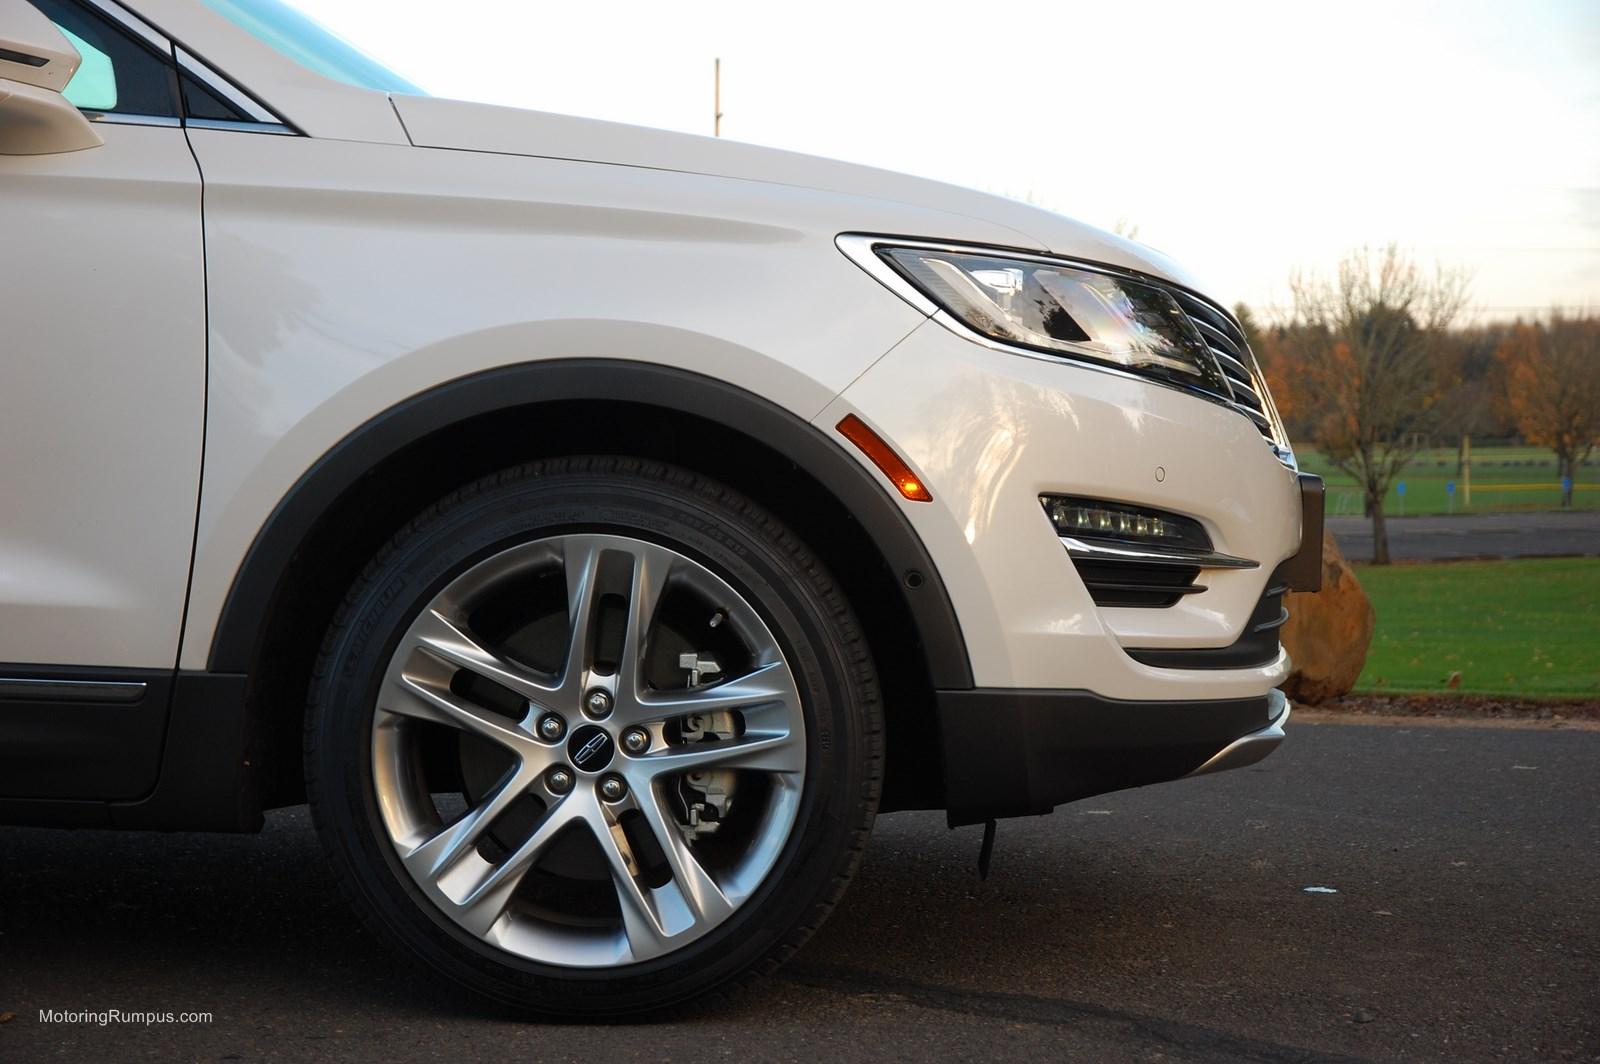 2015 Lincoln MKC 19-inch Wheels